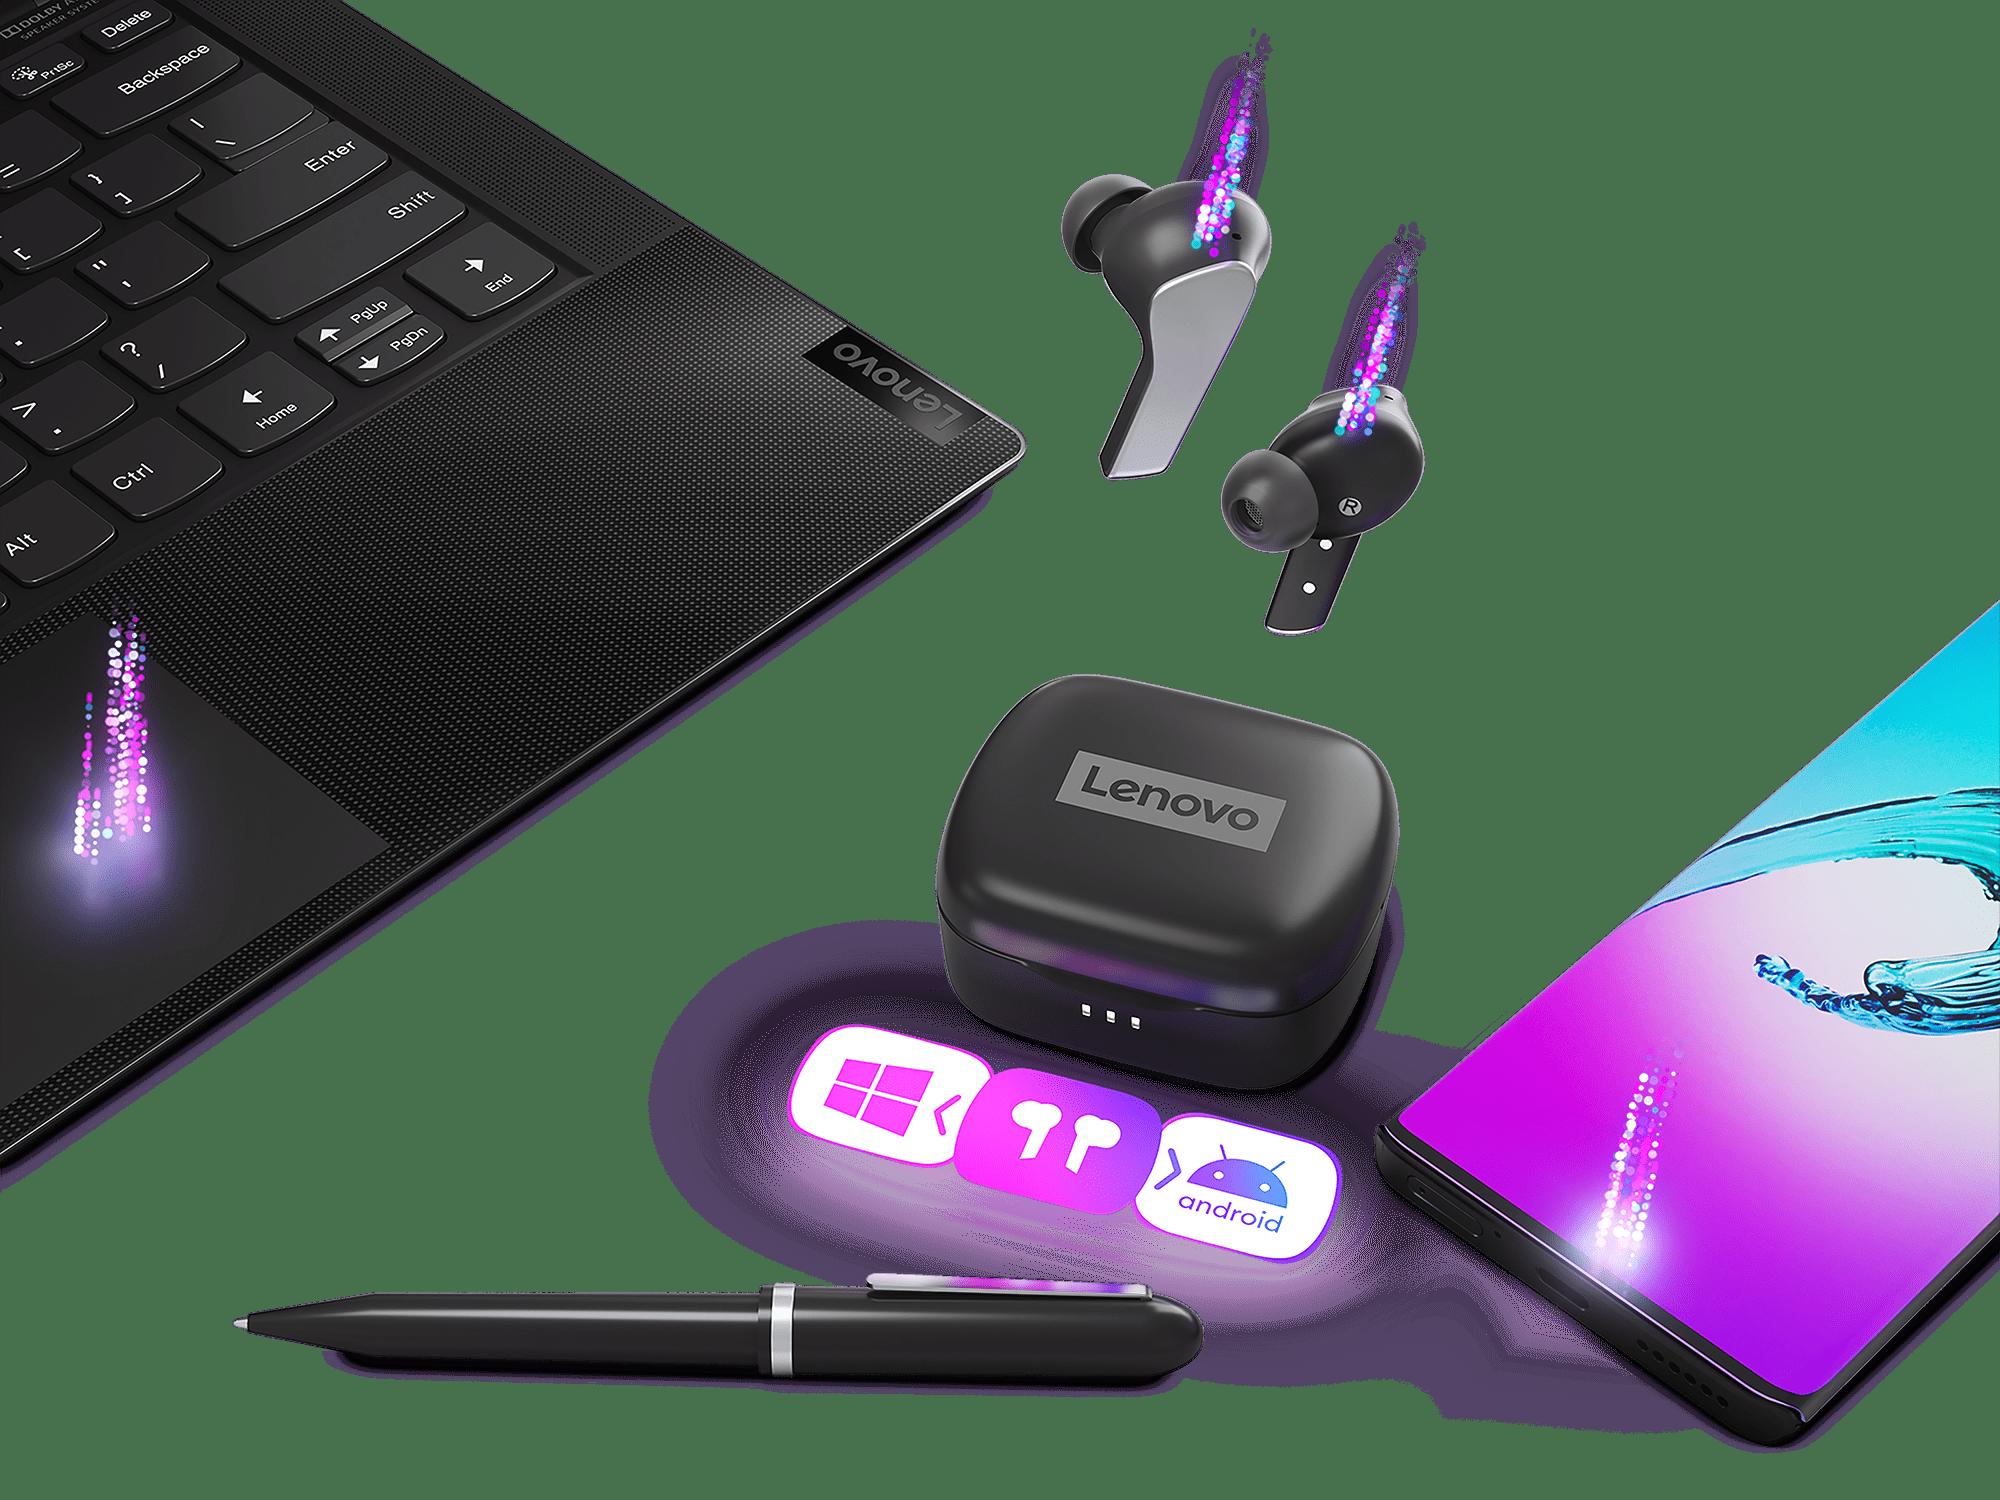 Lenovo Smart Wireless